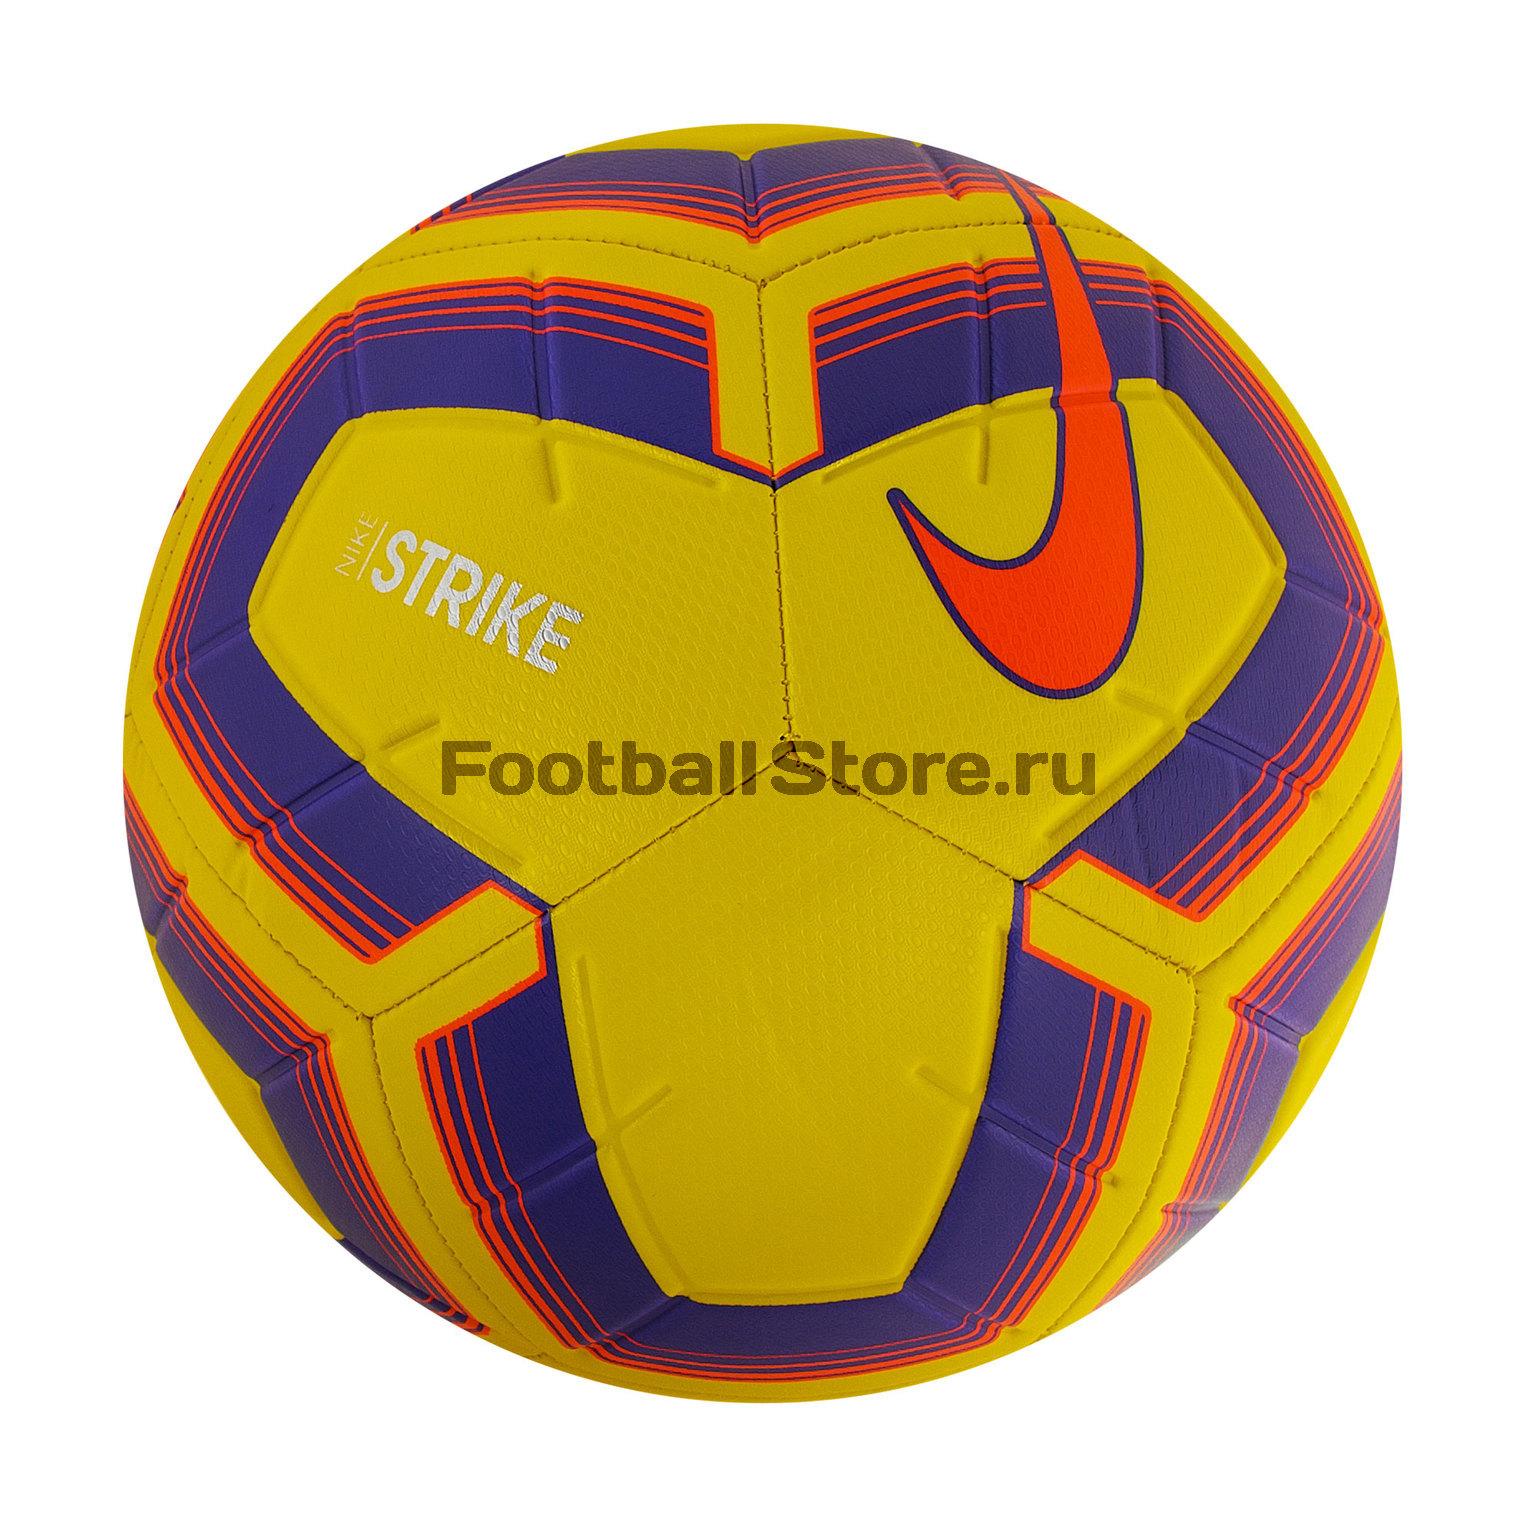 Фото - Футбольный мяч Nike Strike Team SC3535-710 футбольный мяч nike barcelona strike sc3365 455